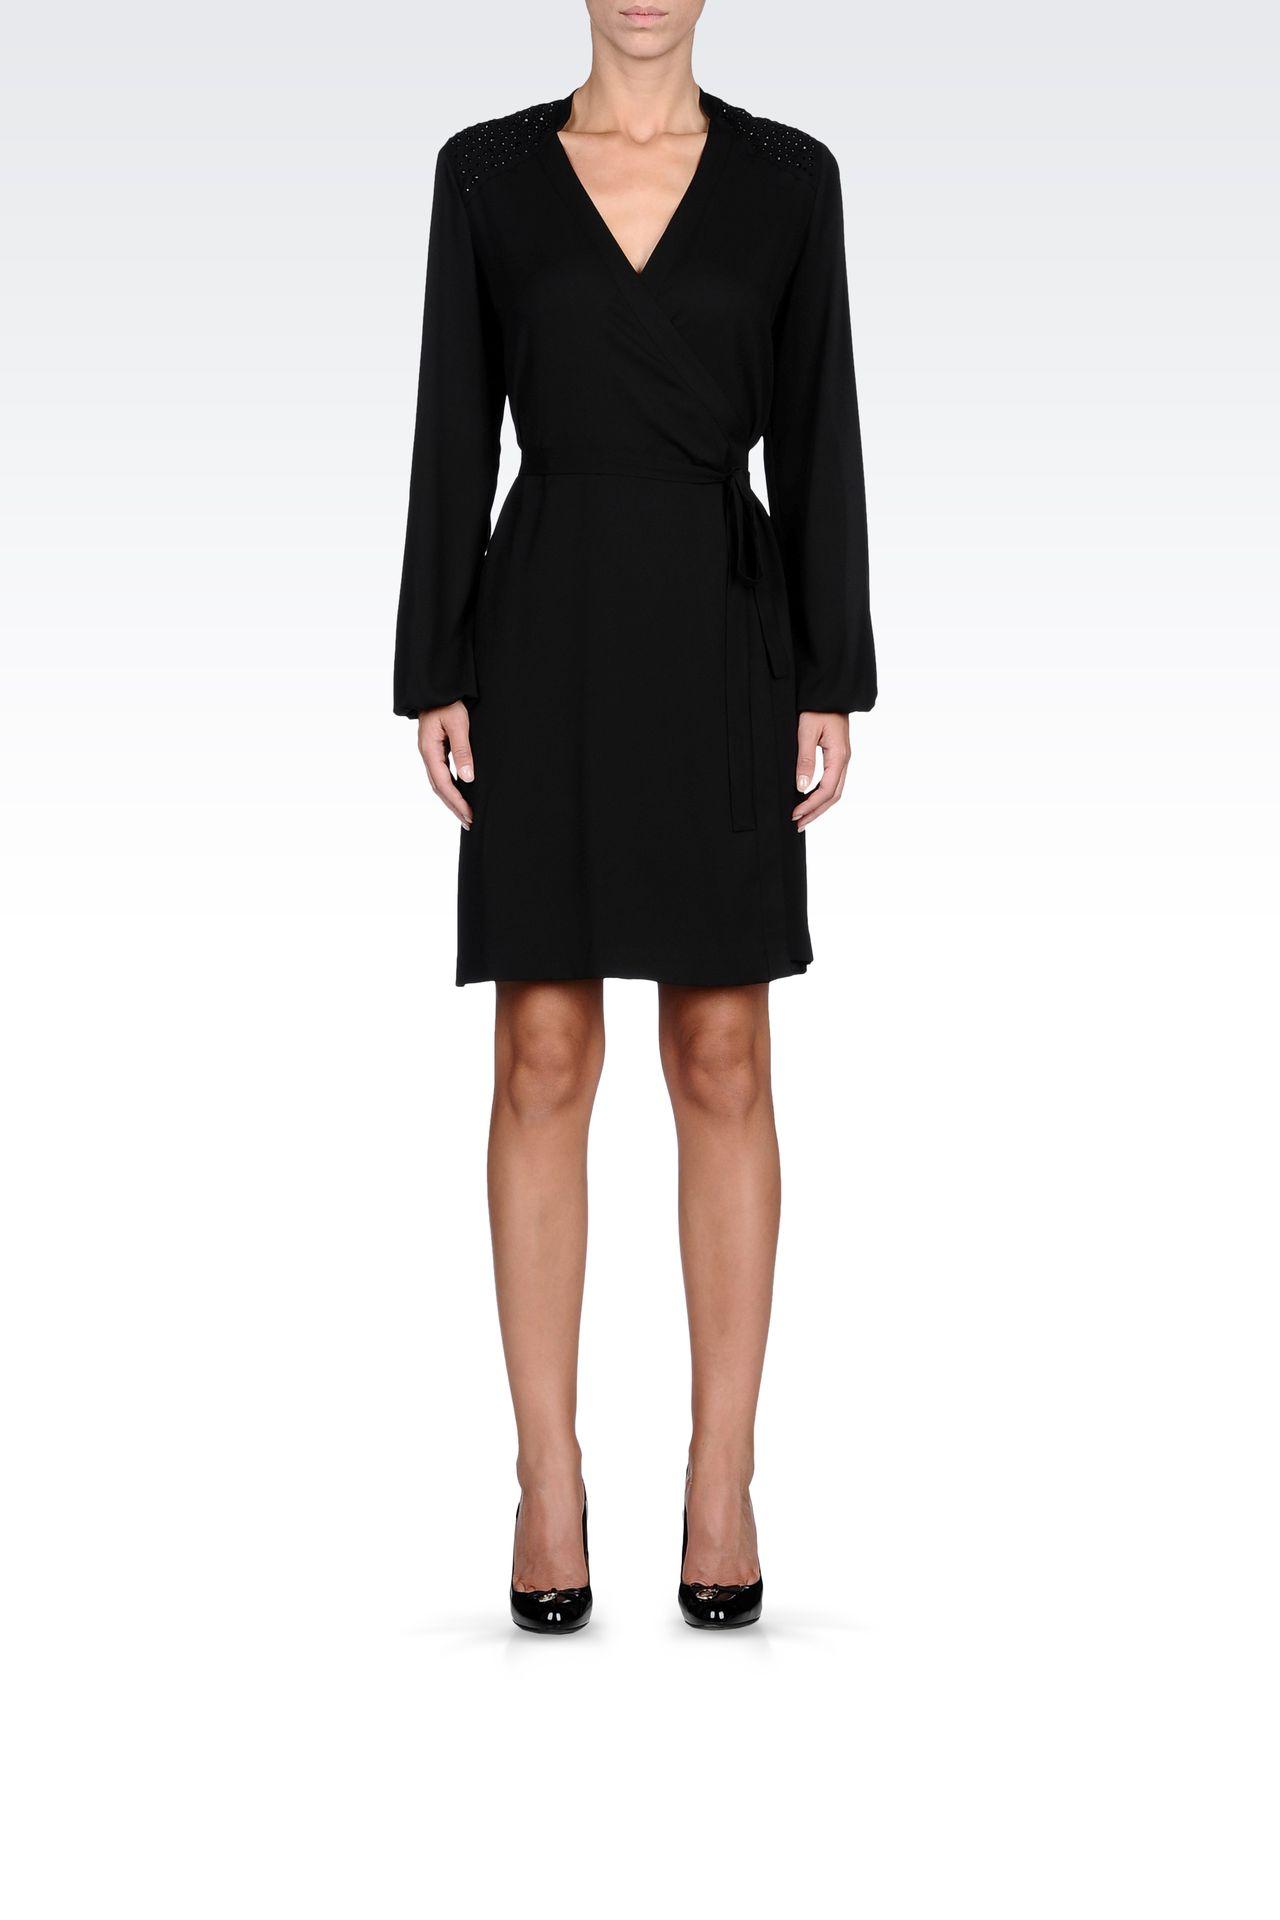 SWAROVSKI-EMBELLISHED CRÊPE DRESS: Short Dresses Women by Armani - 0